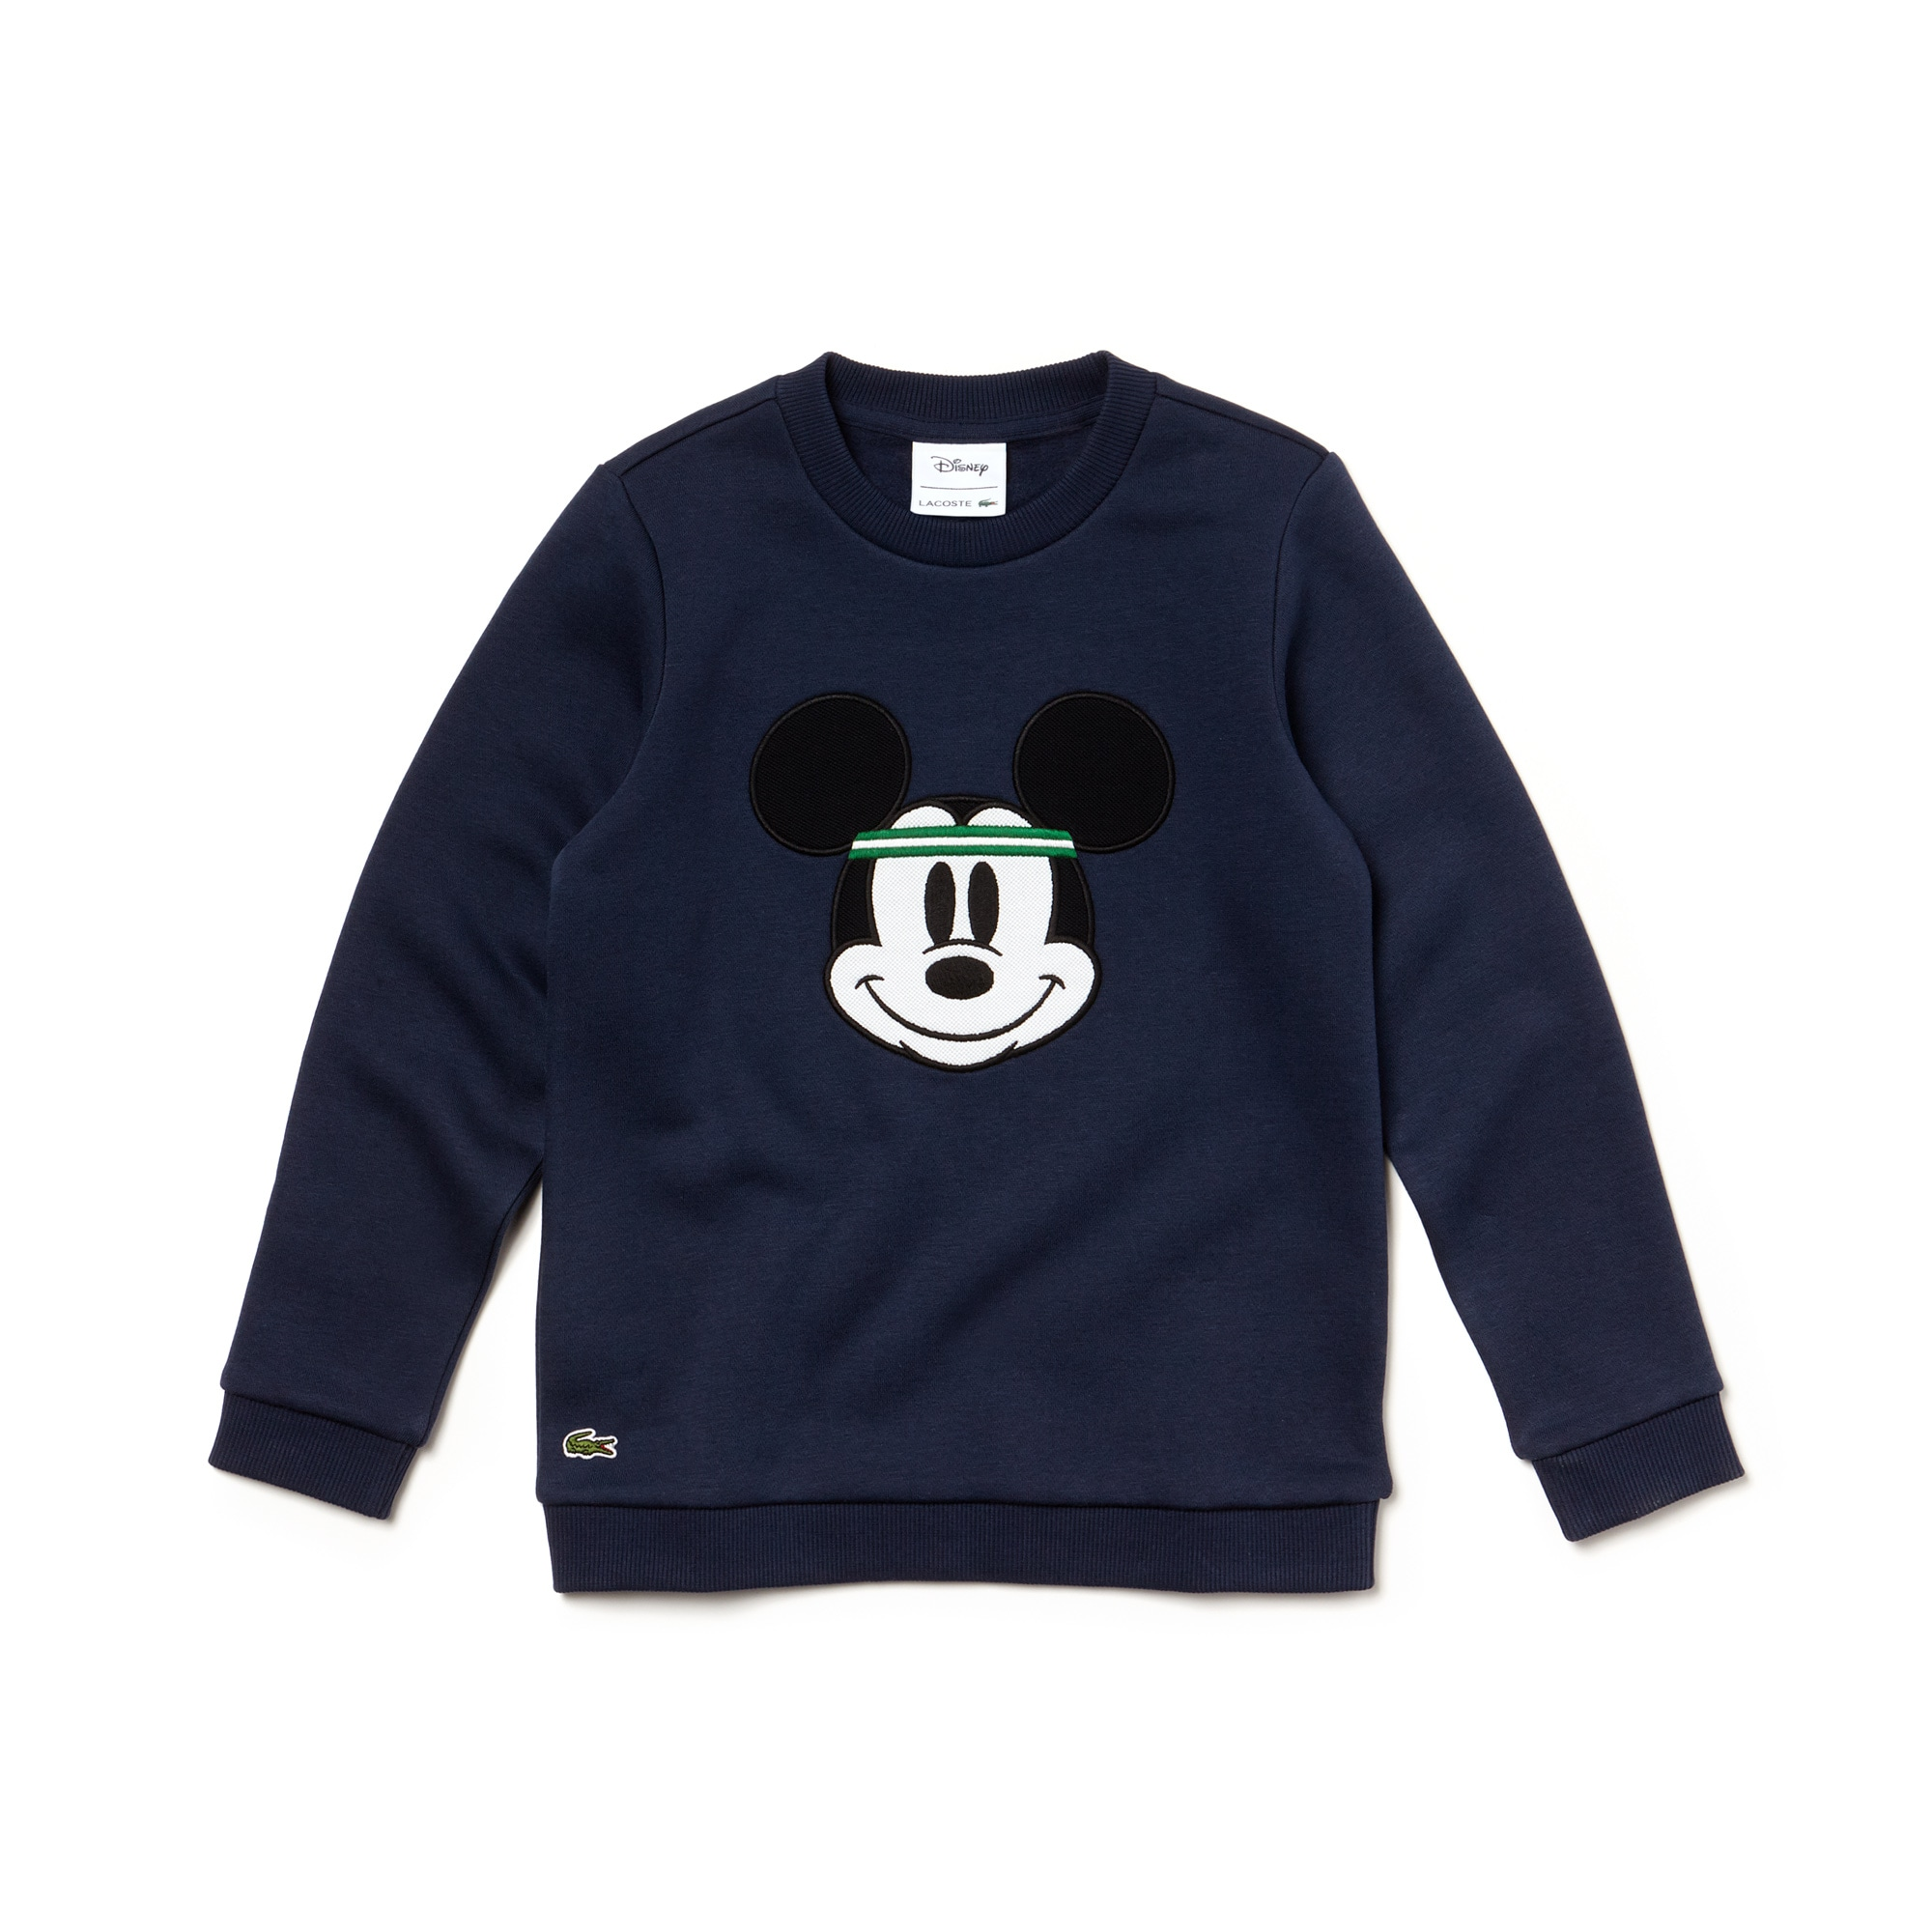 81d98b4c5b Disney | LACOSTE